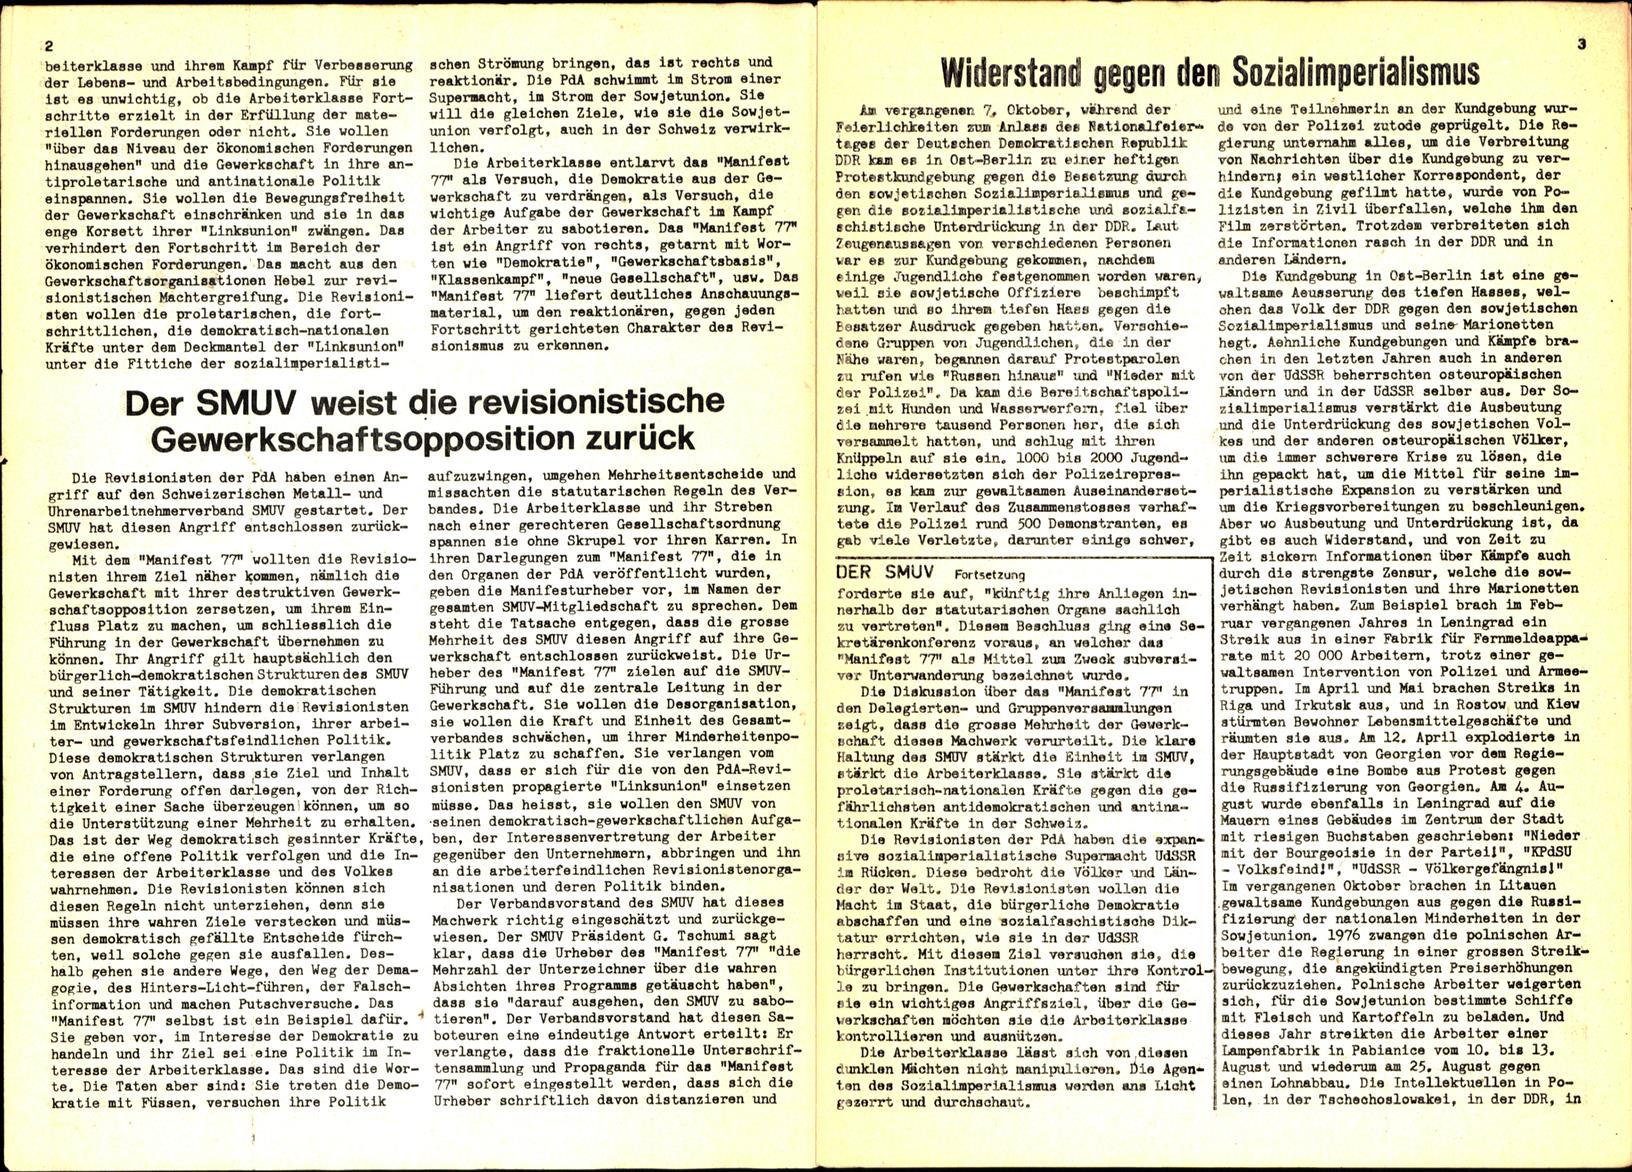 Schweiz_KPSML_Oktober_19771200_117_002